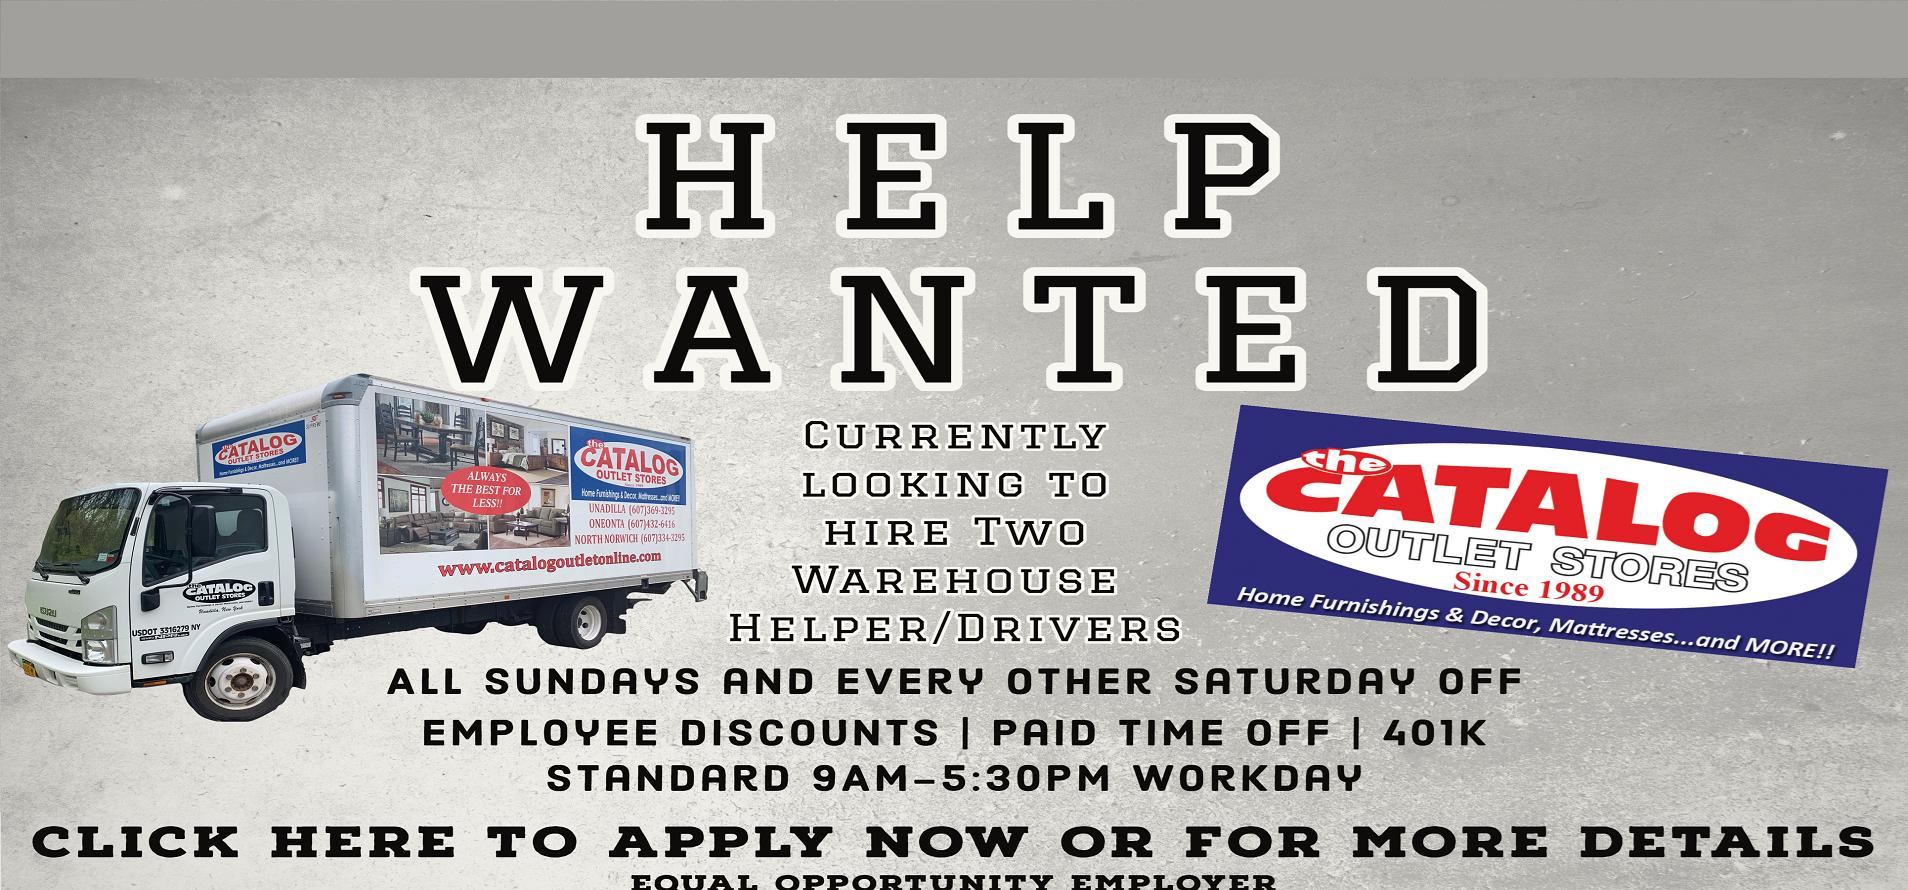 Hiring Warehouse